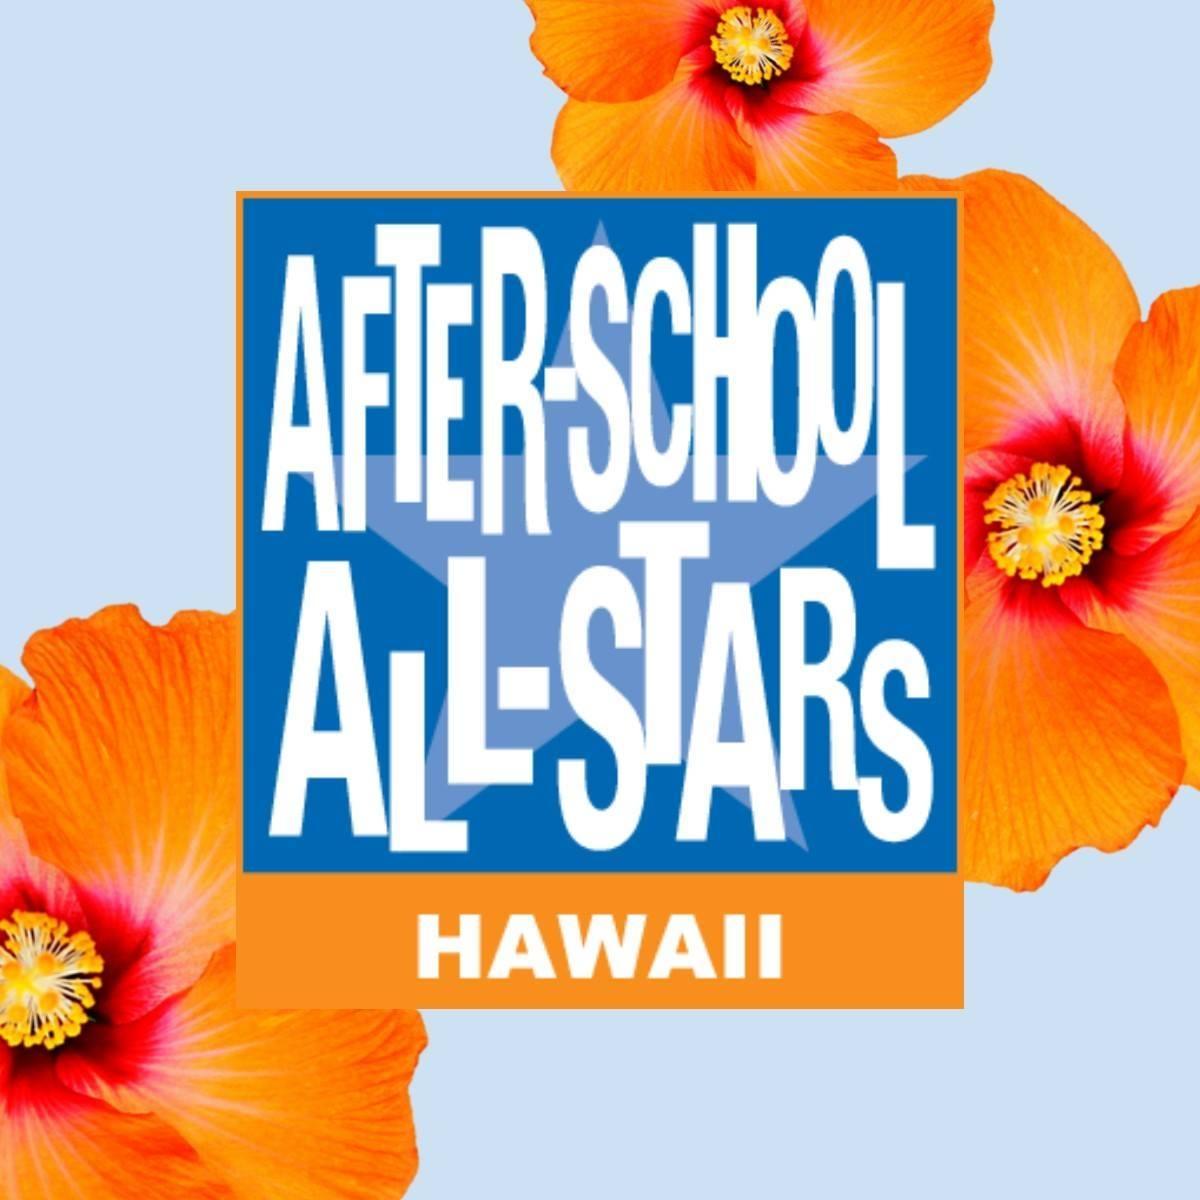 After-School All-Stars Hawaii Facebook Reviews